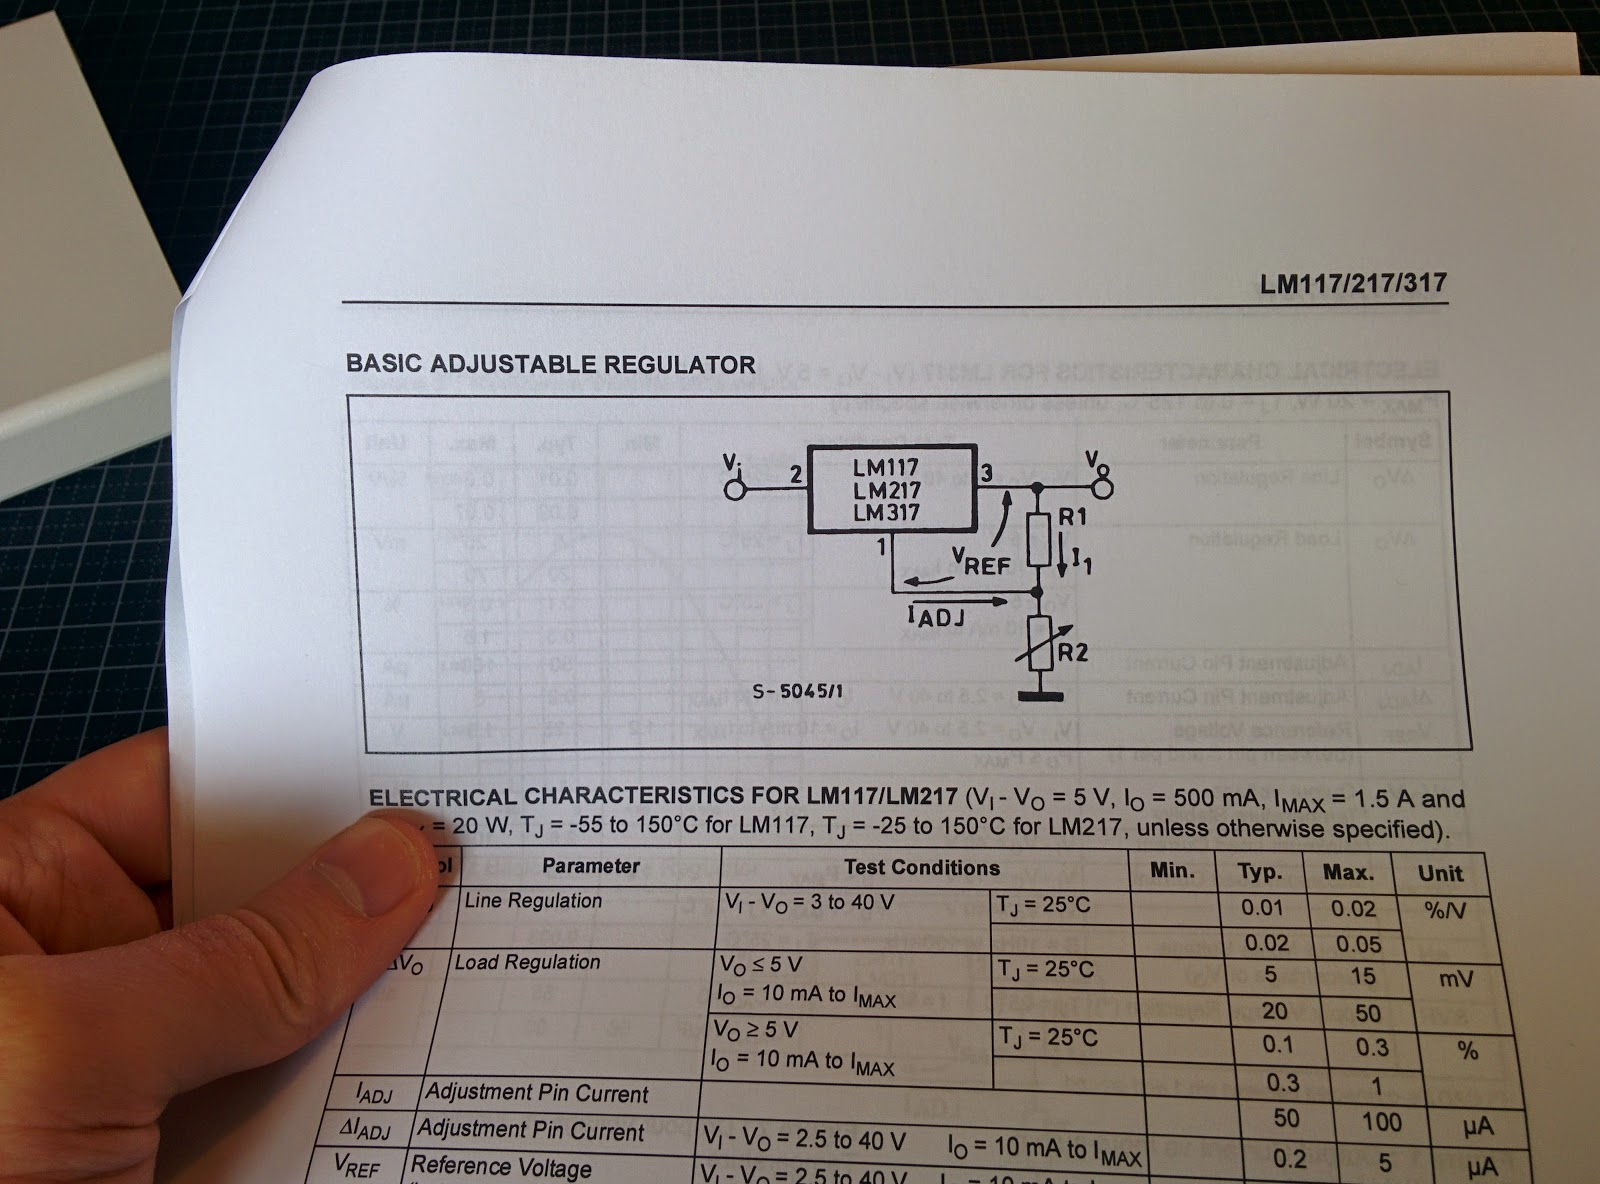 LM317 Spec sheet